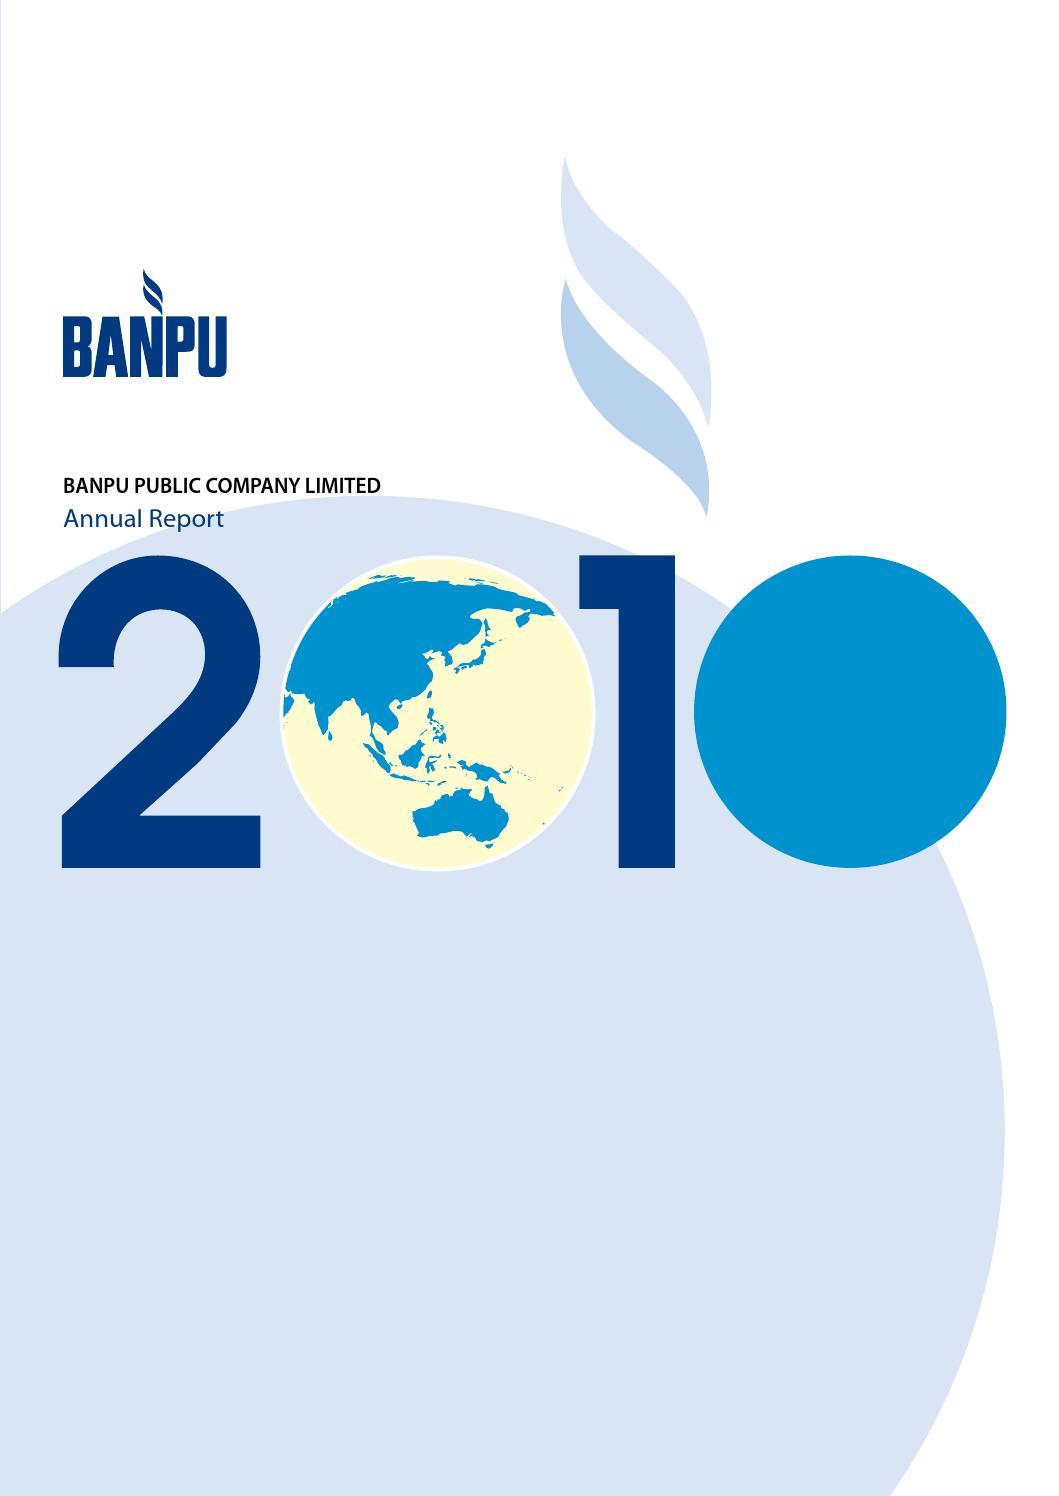 banpu power investment china ltd replacements